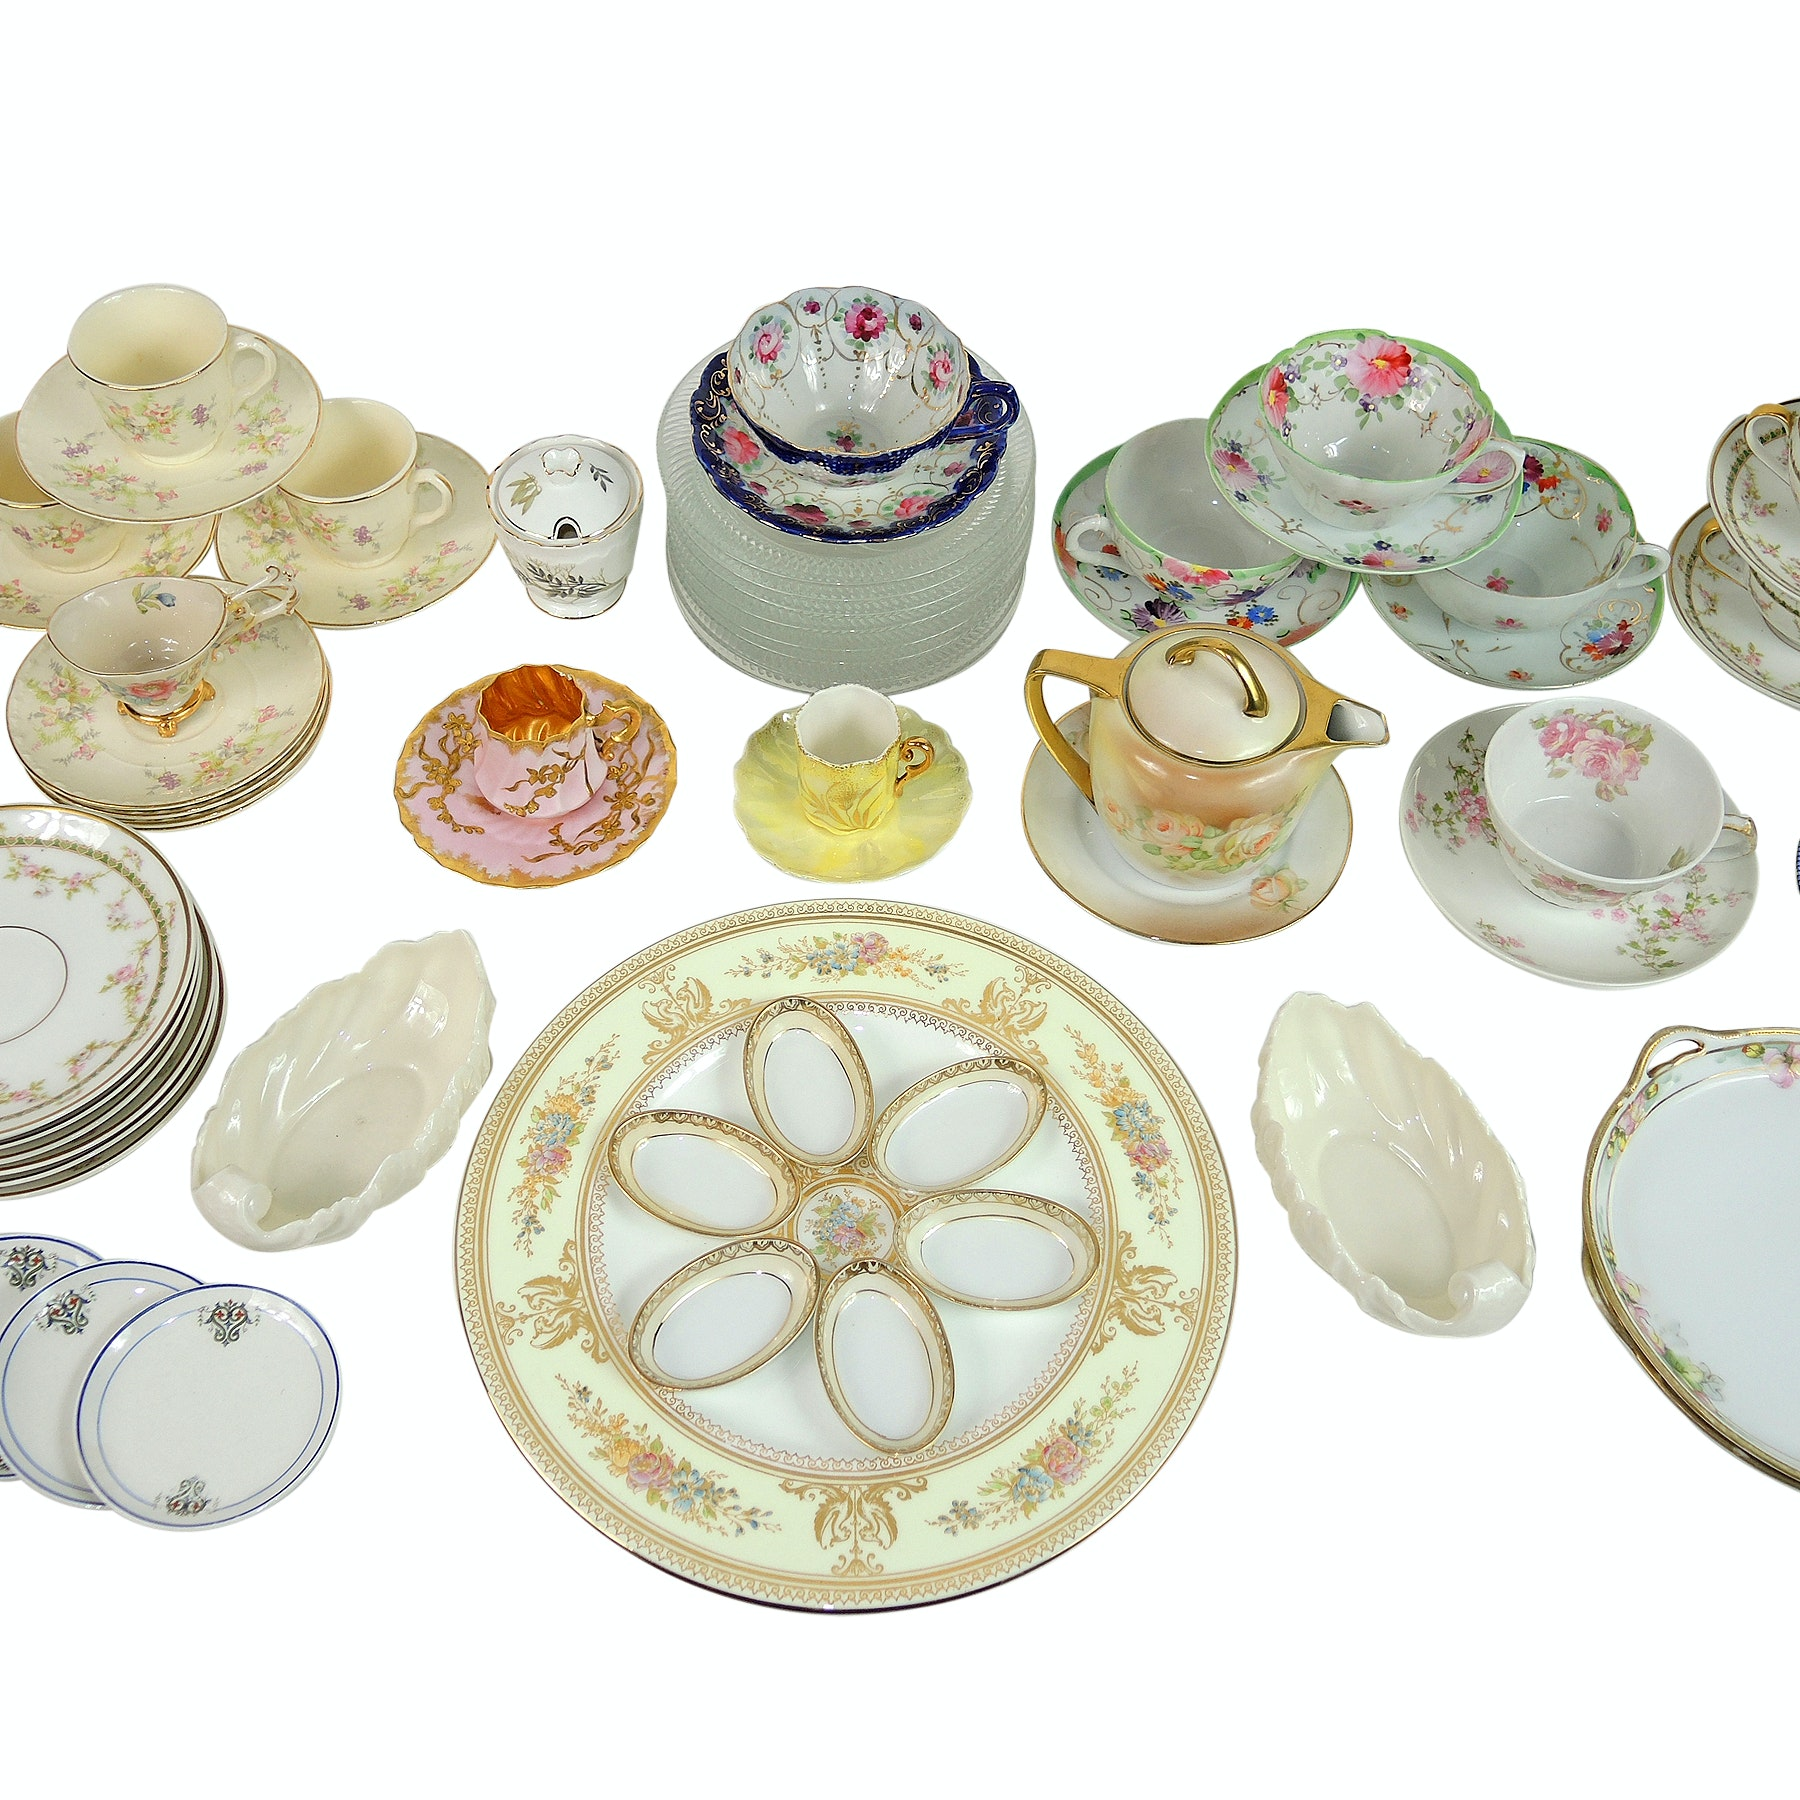 Vintage Porcelain Hand-Painted Tableware including Belleek Limoges and Wedgwood ...  sc 1 st  EBTH.com & Vintage Porcelain Hand-Painted Tableware including Belleek Limoges ...